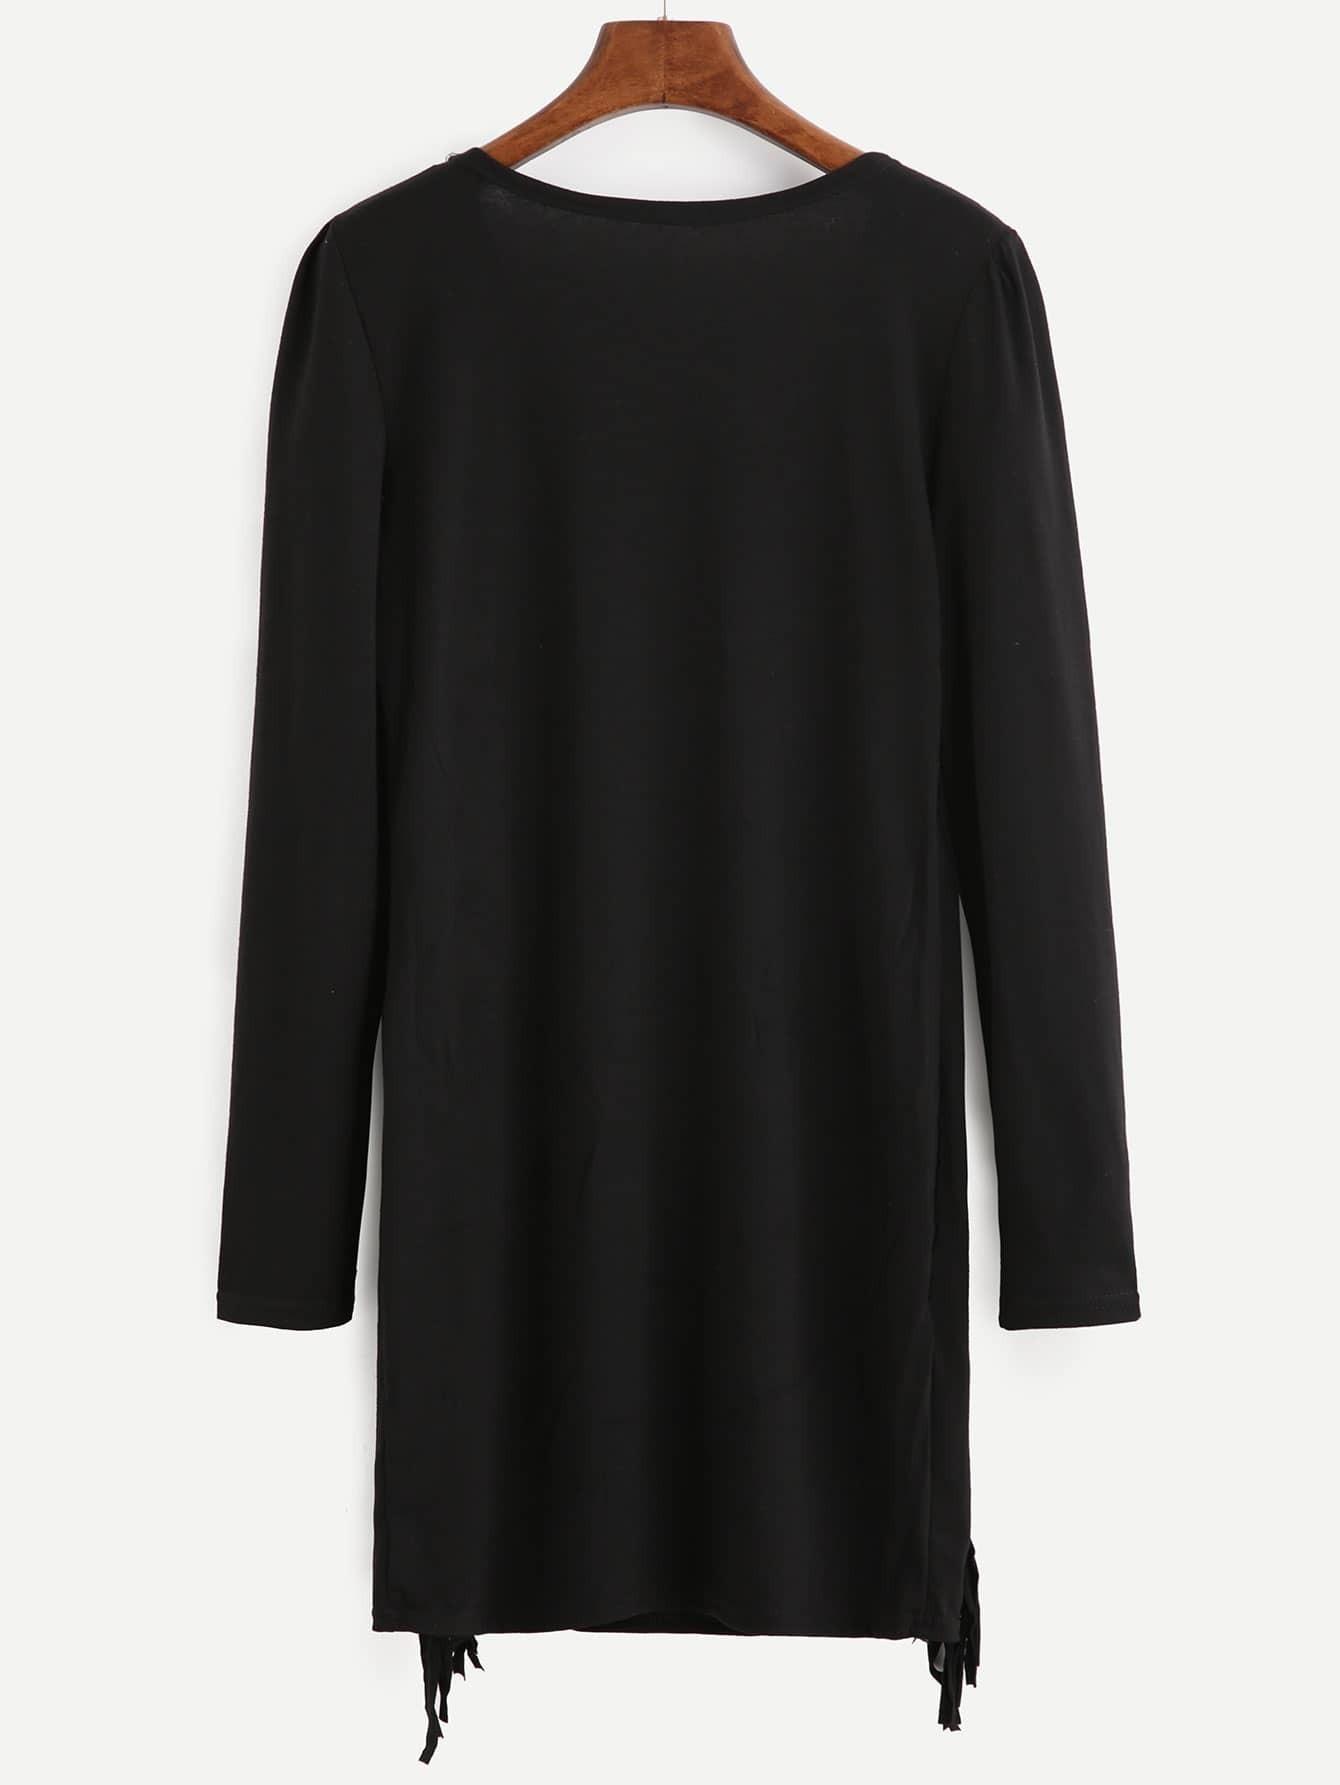 robe t shirt manche longue avec franges noir french romwe. Black Bedroom Furniture Sets. Home Design Ideas